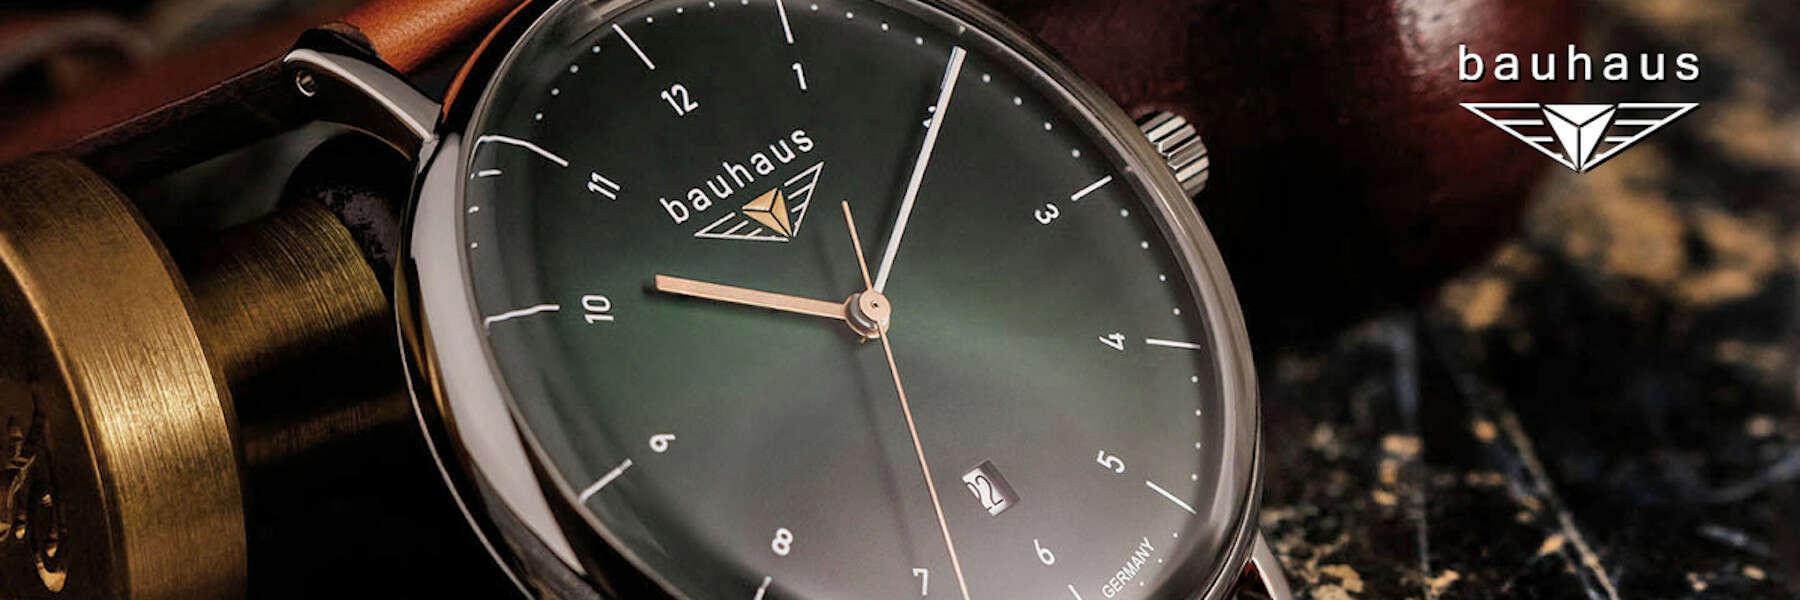 Uhren Daniel Heckmann - Bauhaus